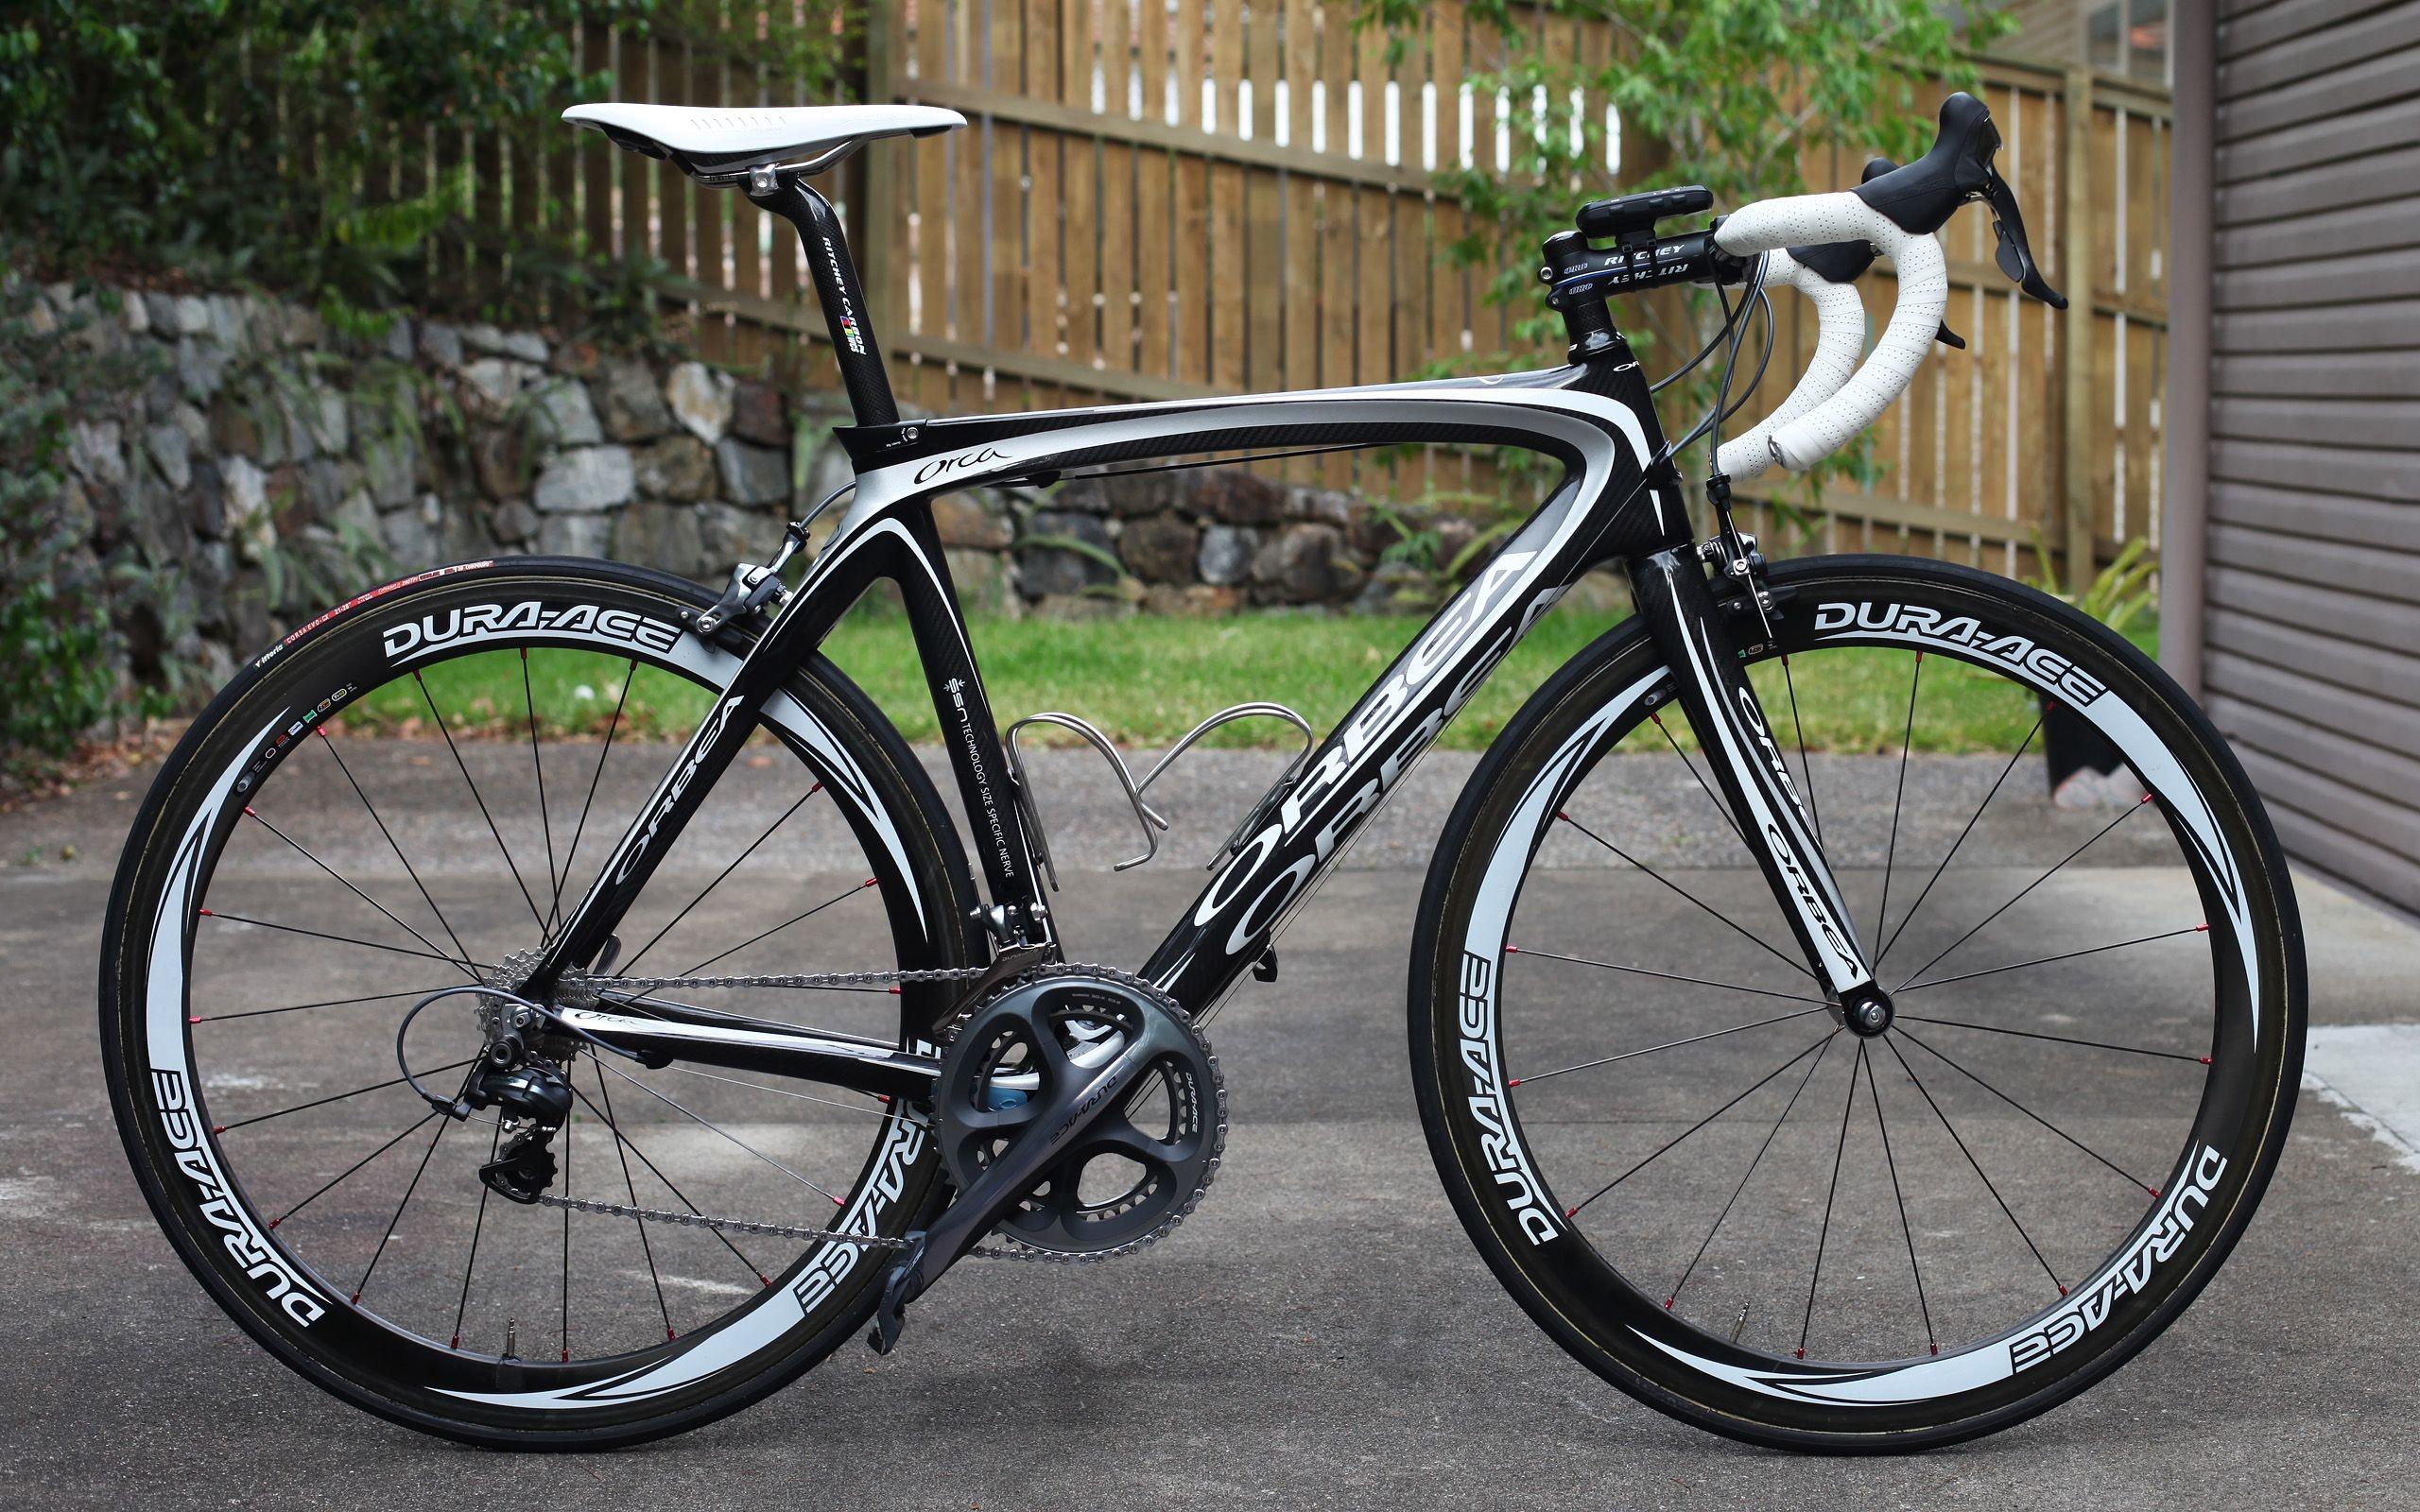 2560x1600, Road Bikes Wallpapers - HD Wallpaper